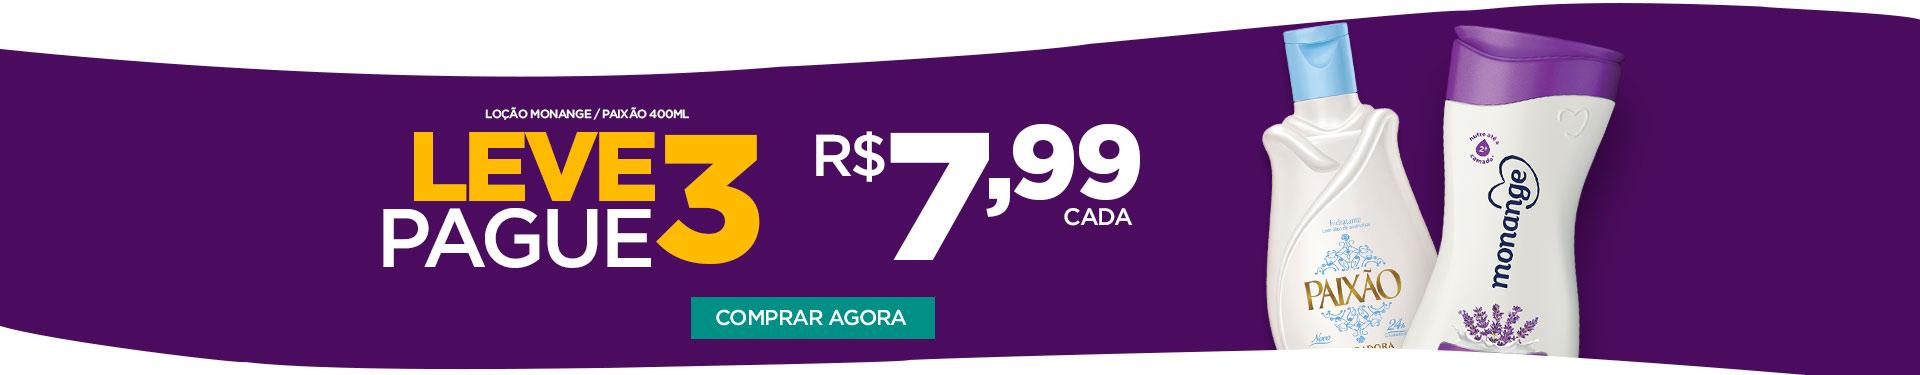 COTY - Monange/Paixão